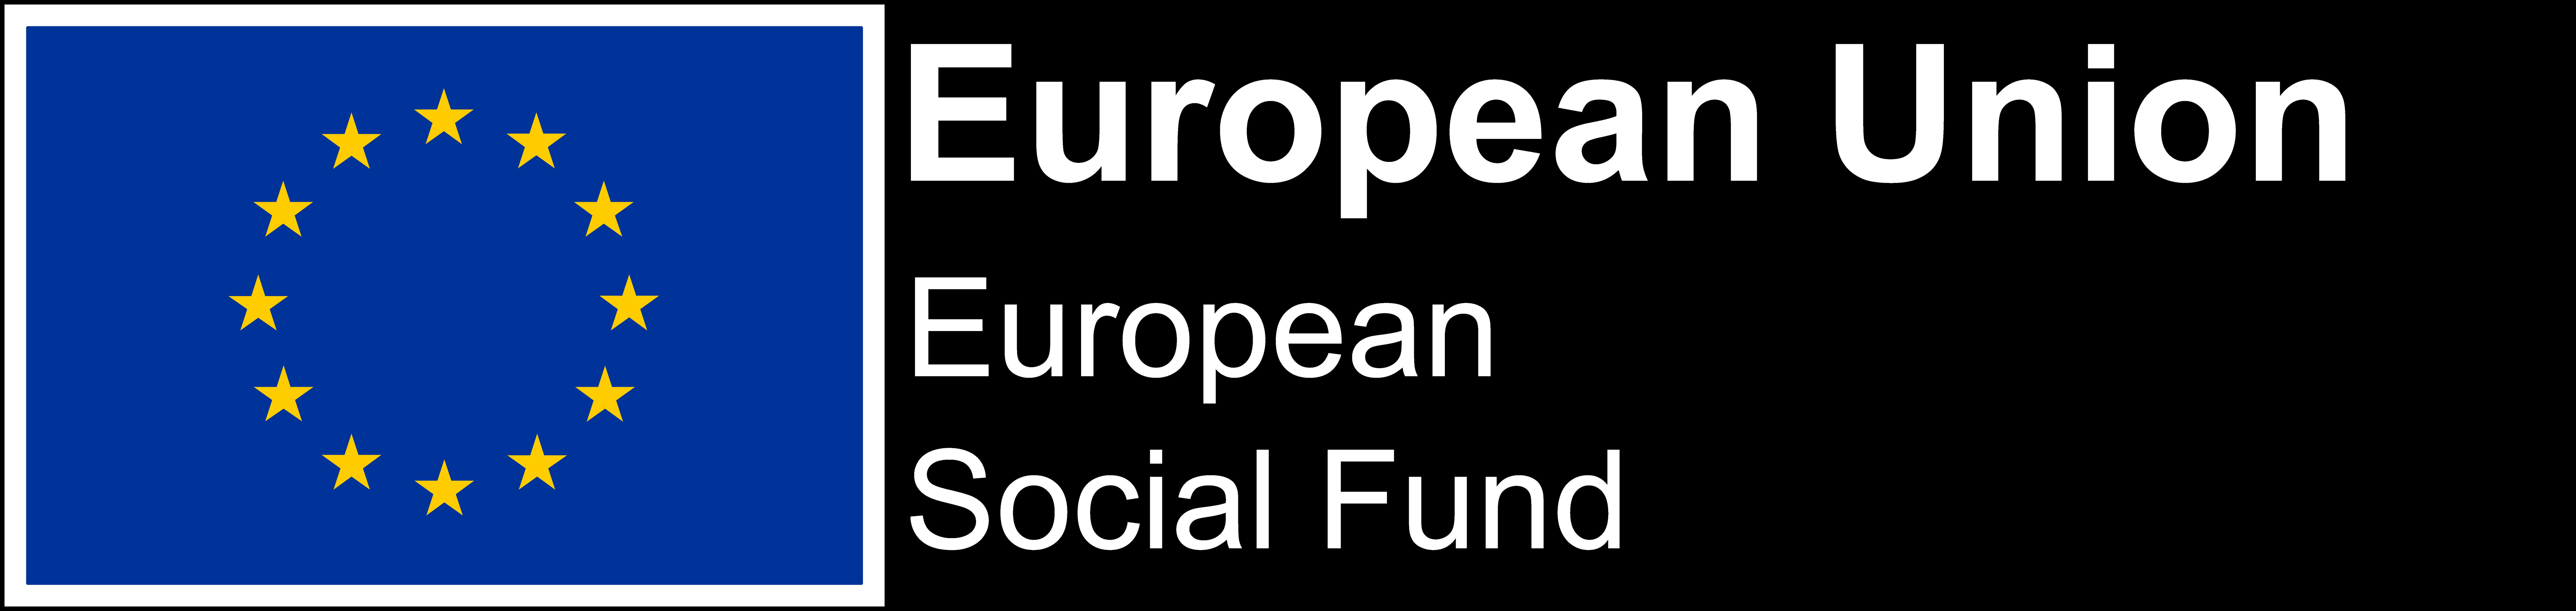 LogoESF_WO_Landscape-EU